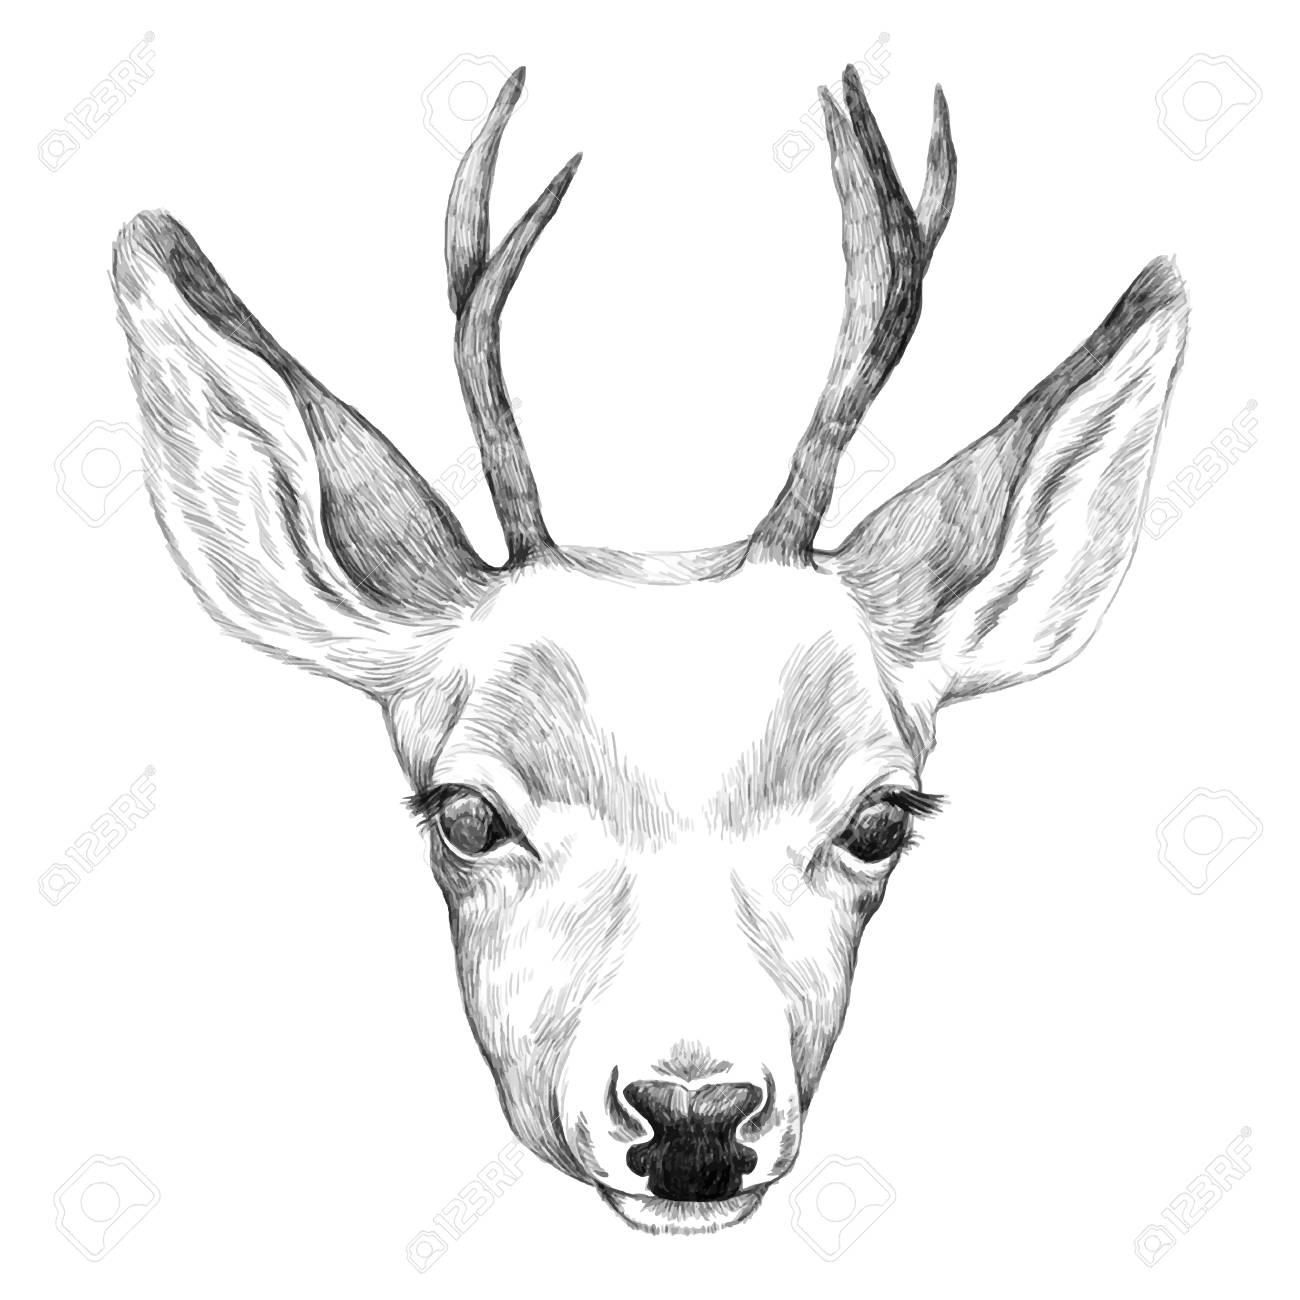 Portrait of deer hand drawn illustration pencil hand drawn sketch stock vector